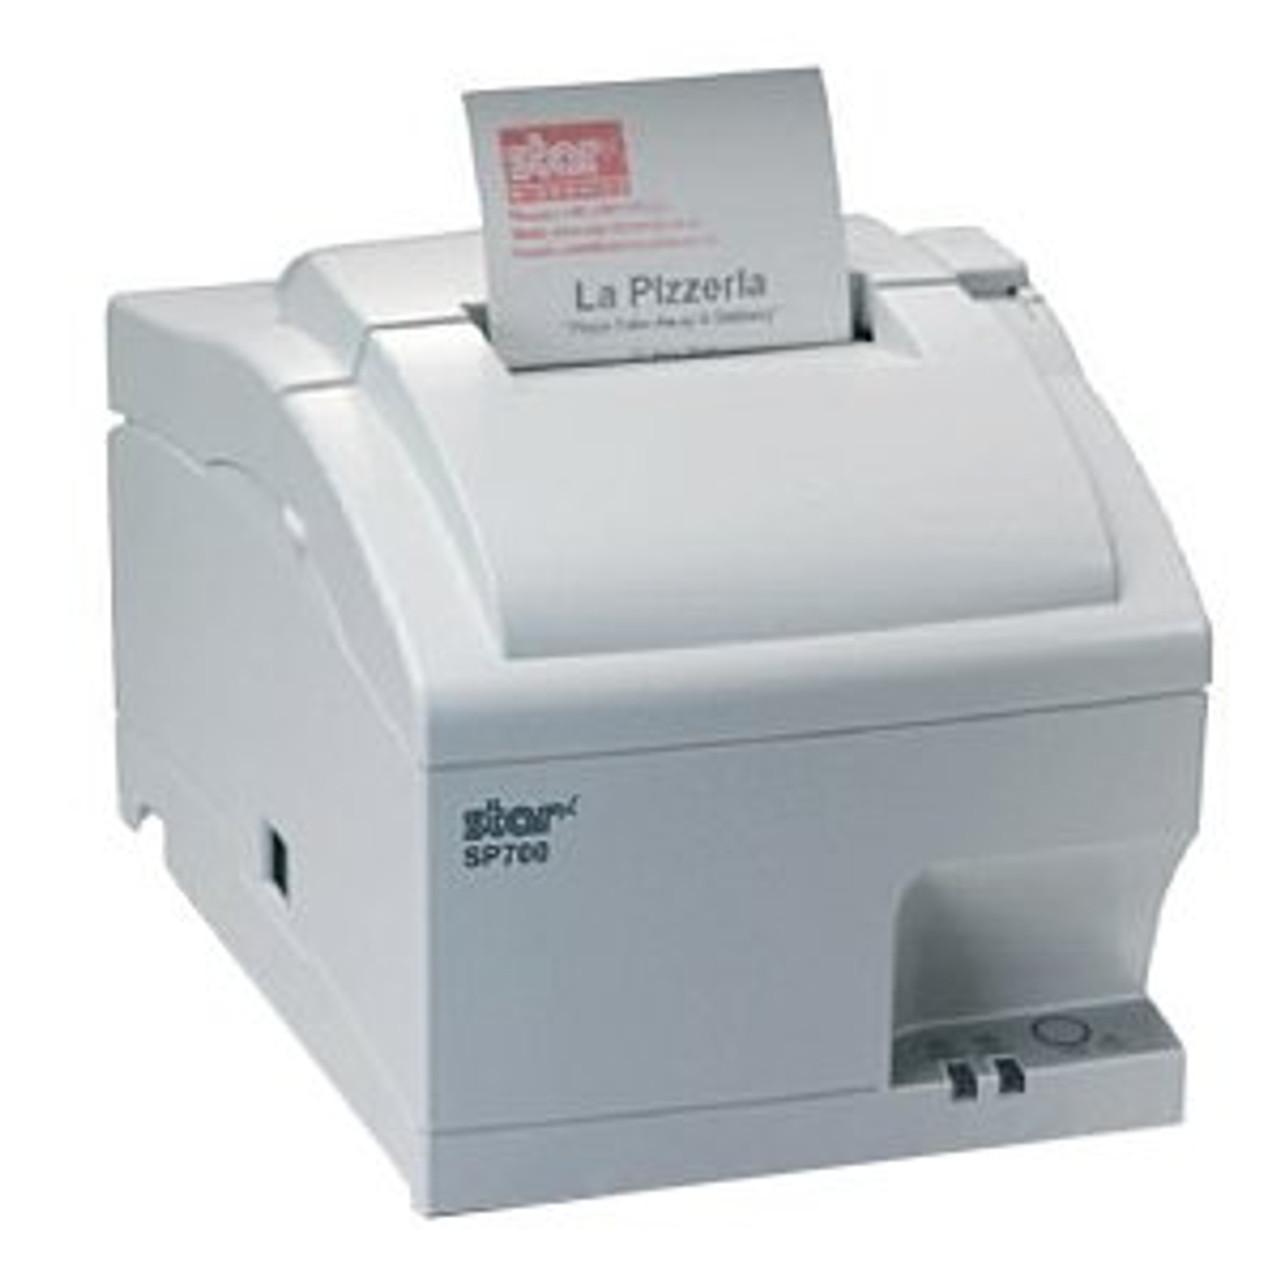 Star SP700 POS Receipt Printer, SP742MC, 39332010, Impact AUTO CUTTER,